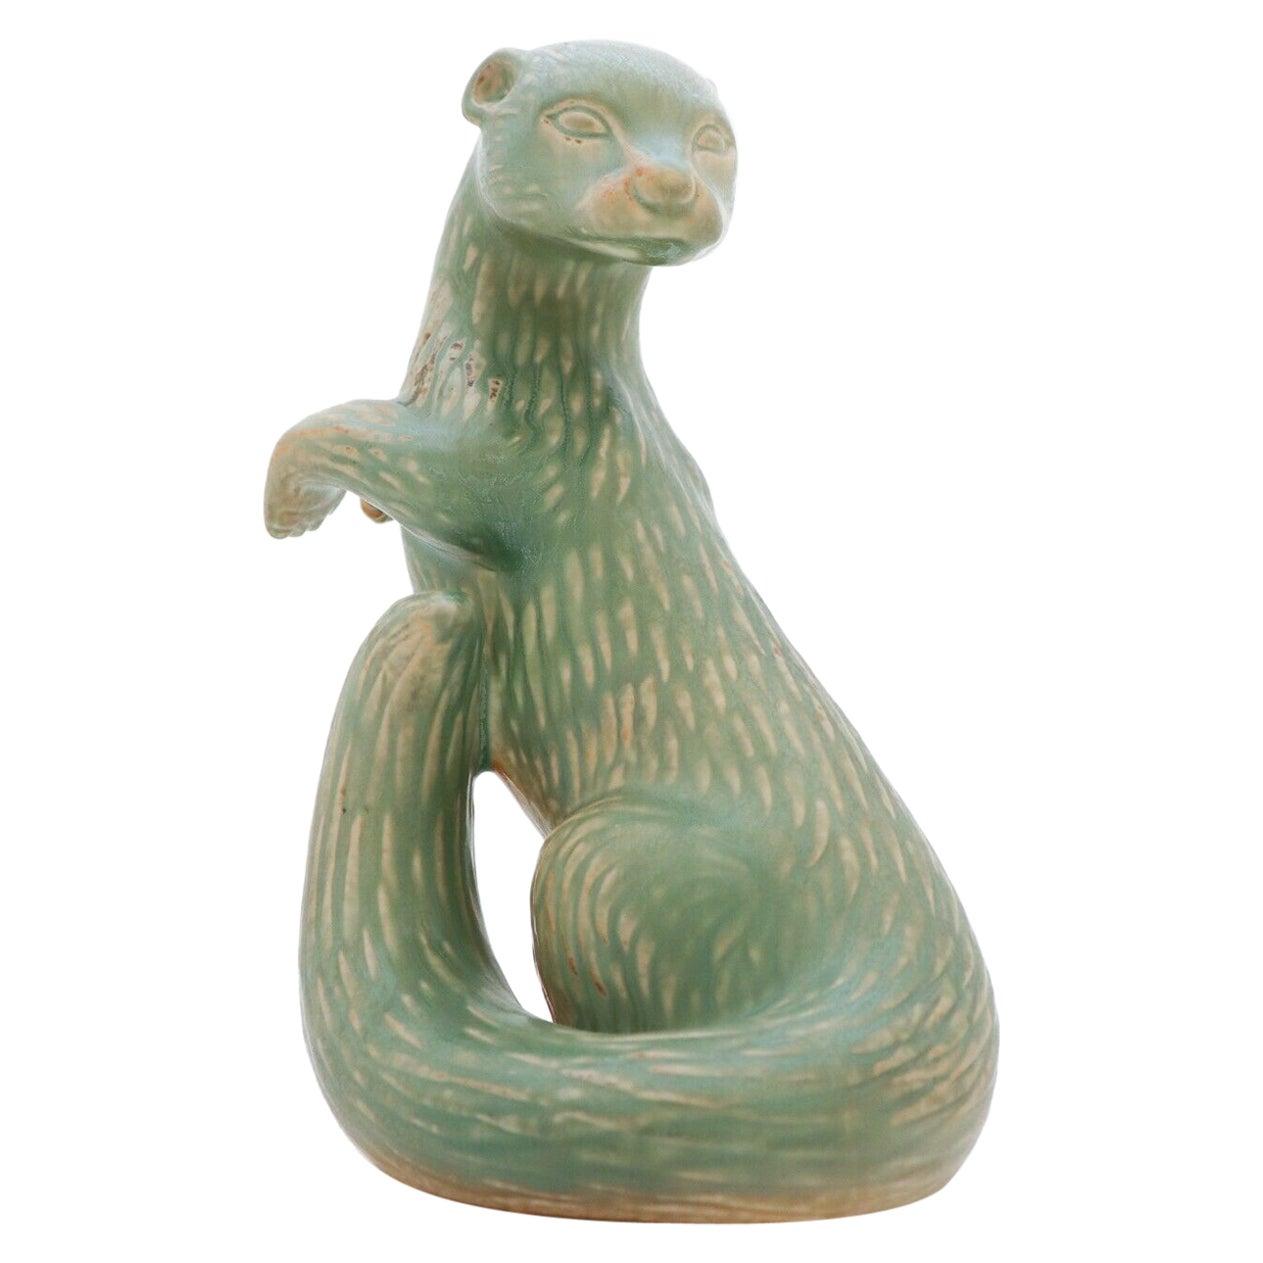 Ceramic Figurine Green Ferret, Gunnar Nylund, Rörstrand, 1950-1960s